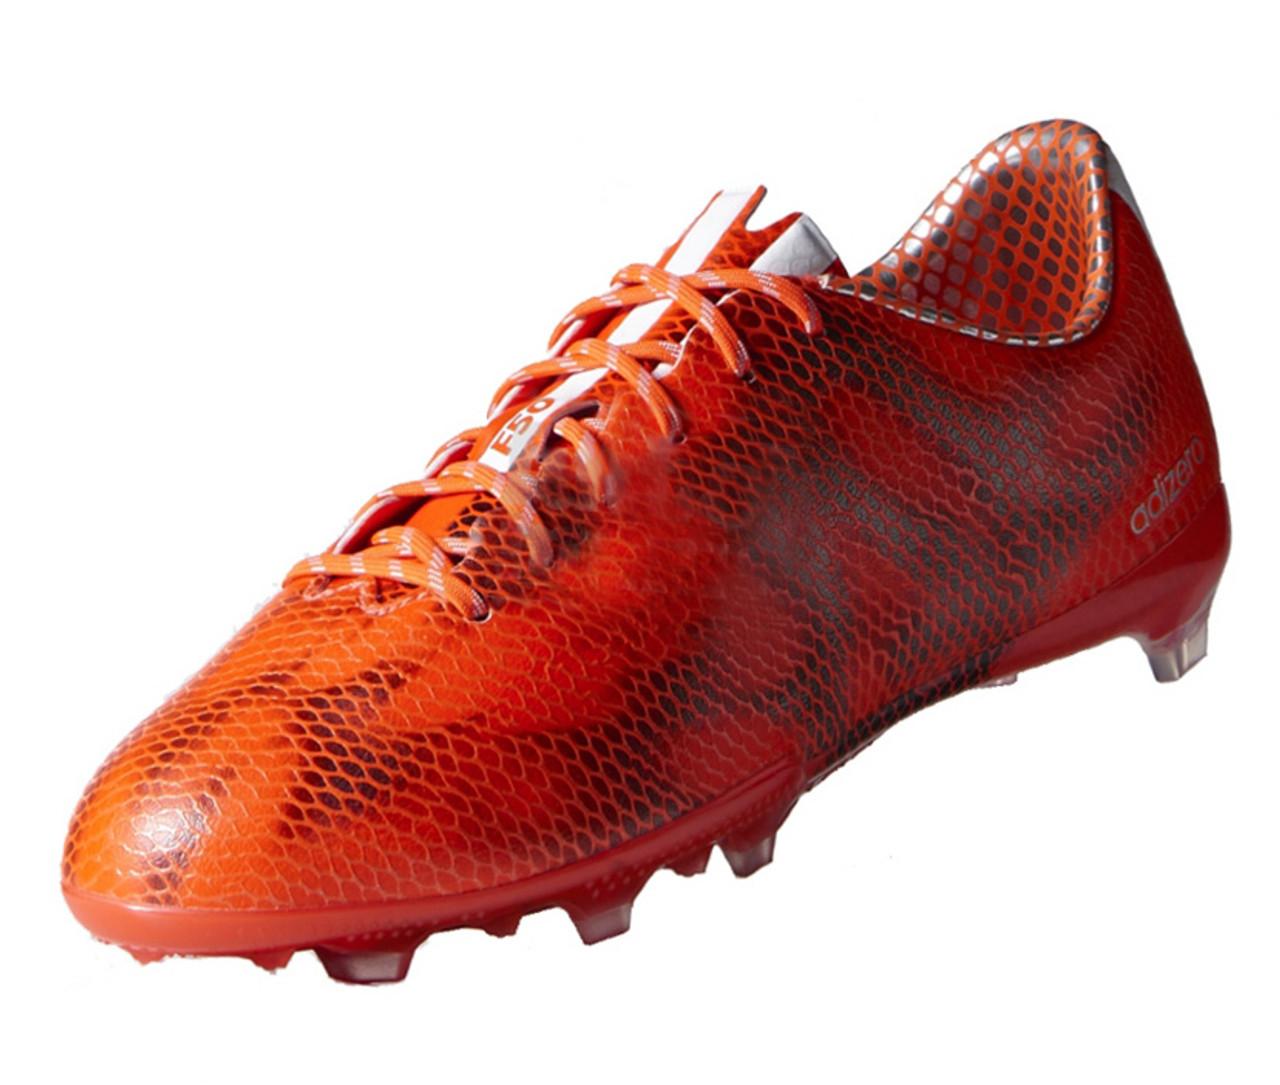 b14e9cb1a adidas Jr F50 adizero FG - Solar Red Black RC - ohp soccer